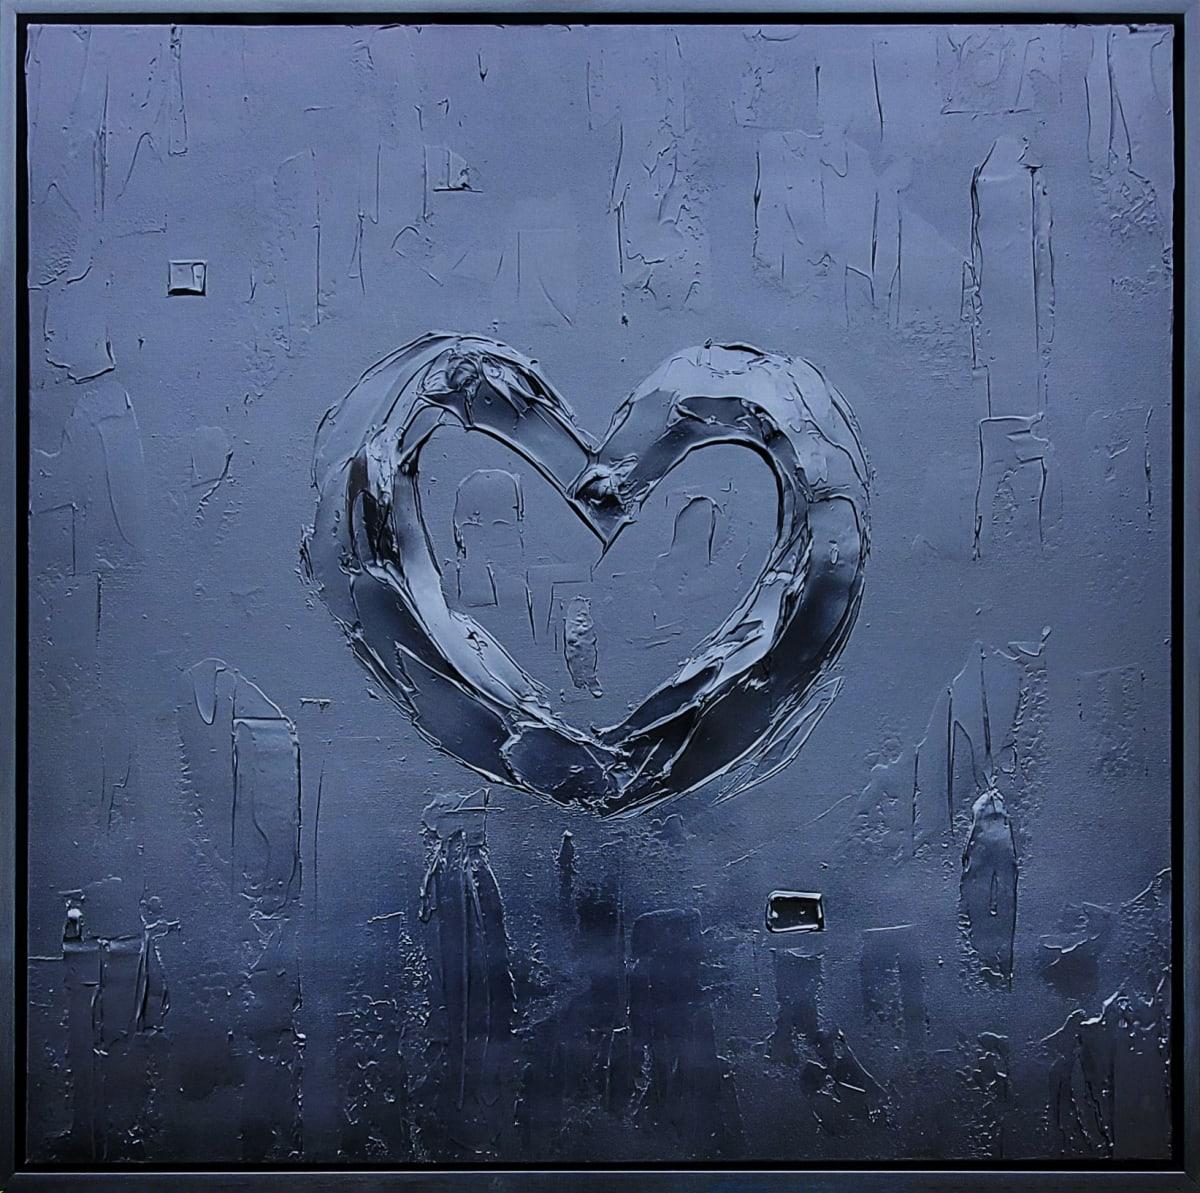 BLACK BOLD HEART by Tariq Mix